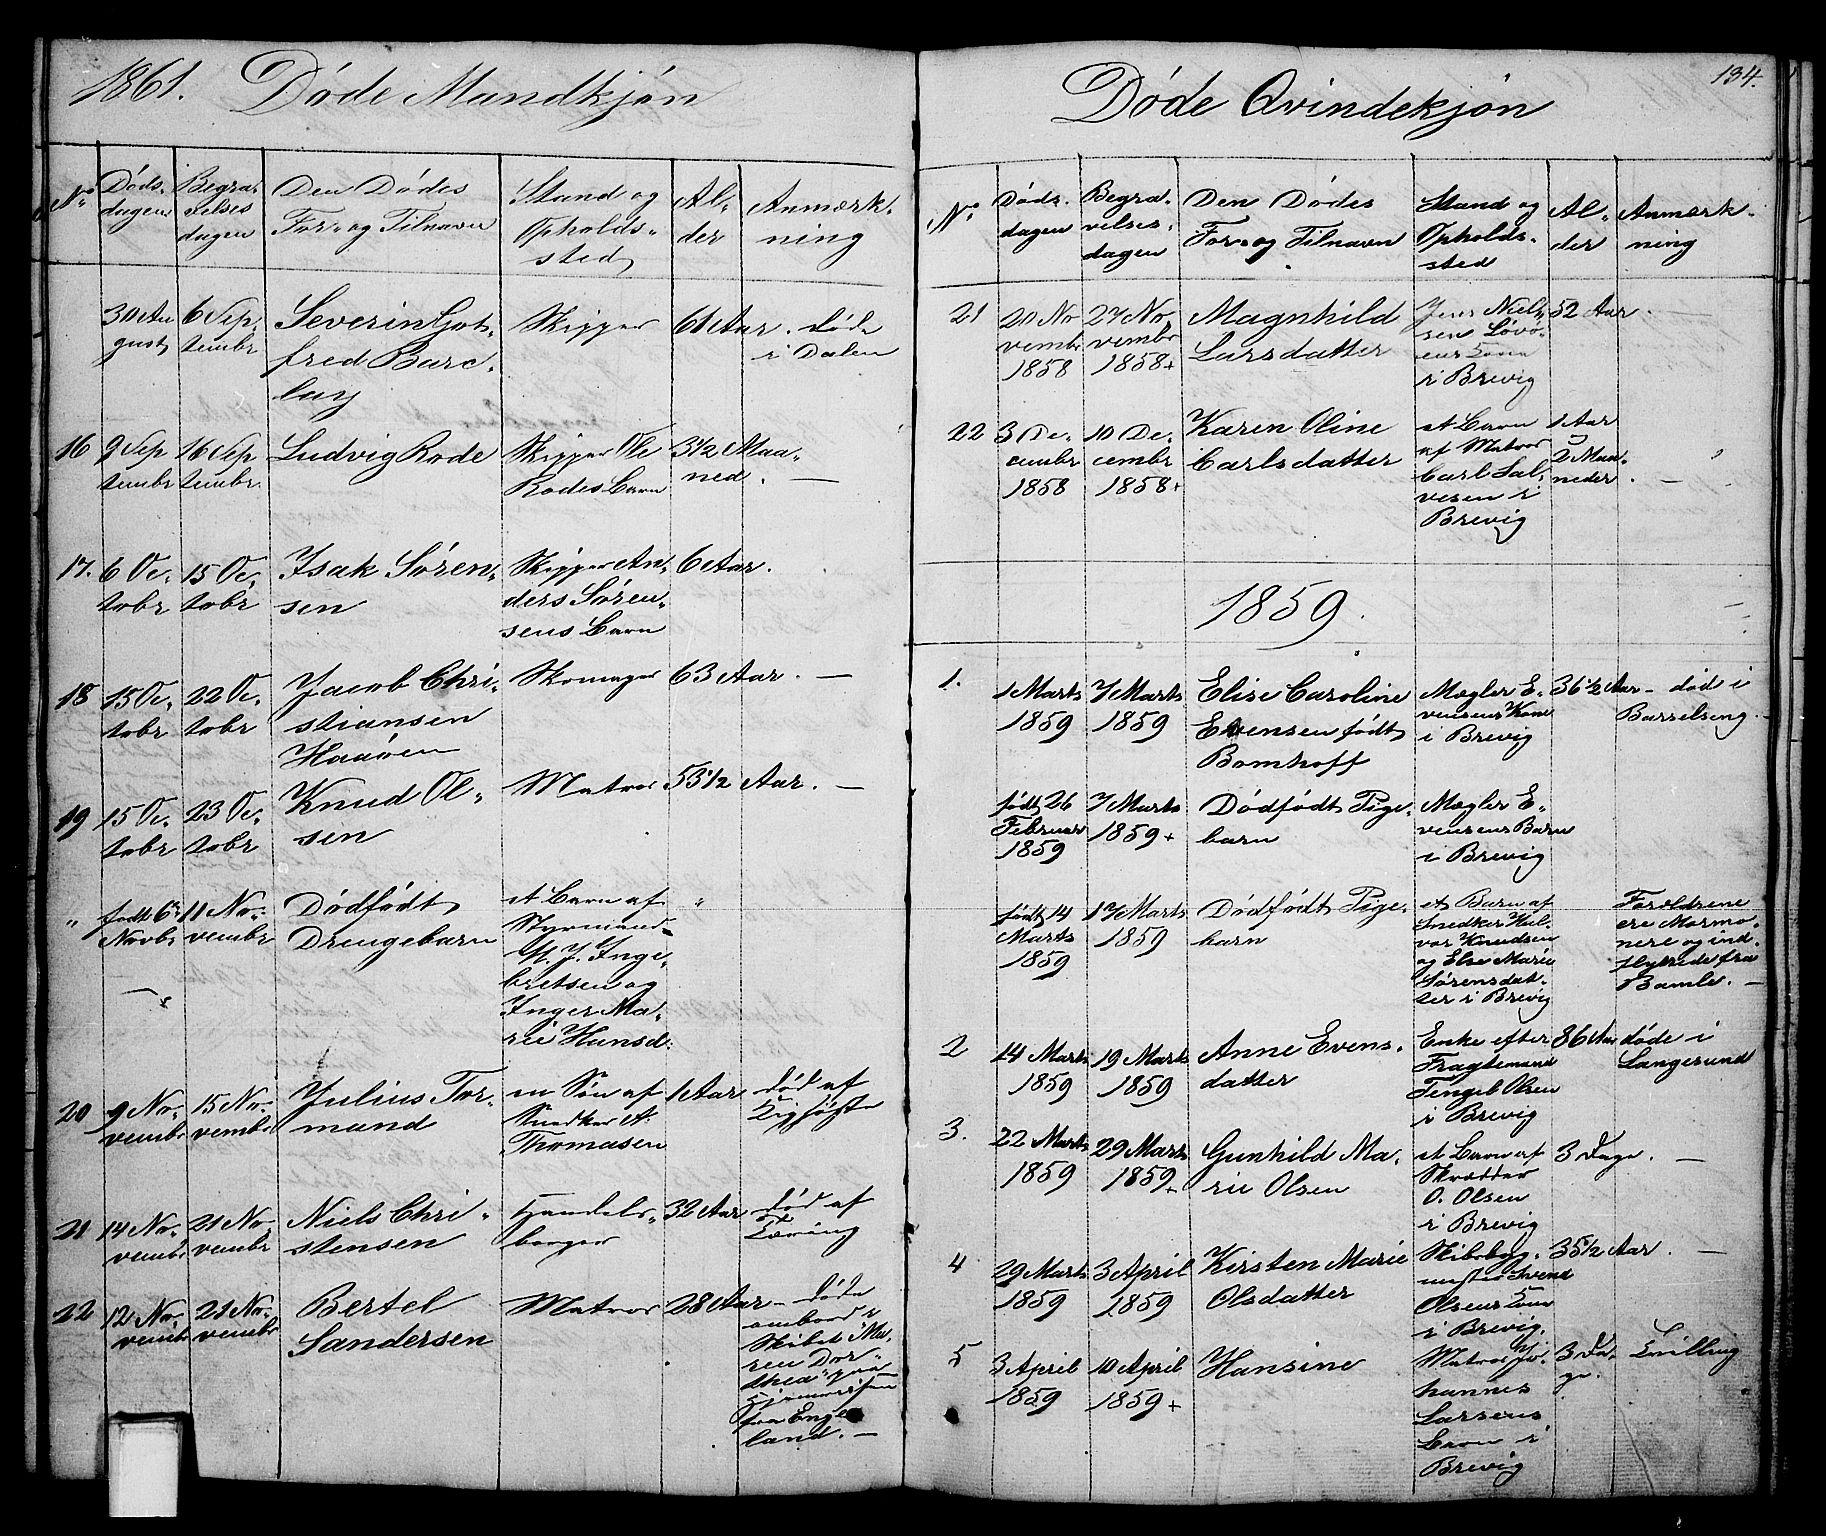 SAKO, Brevik kirkebøker, G/Ga/L0002: Klokkerbok nr. 2, 1846-1865, s. 134